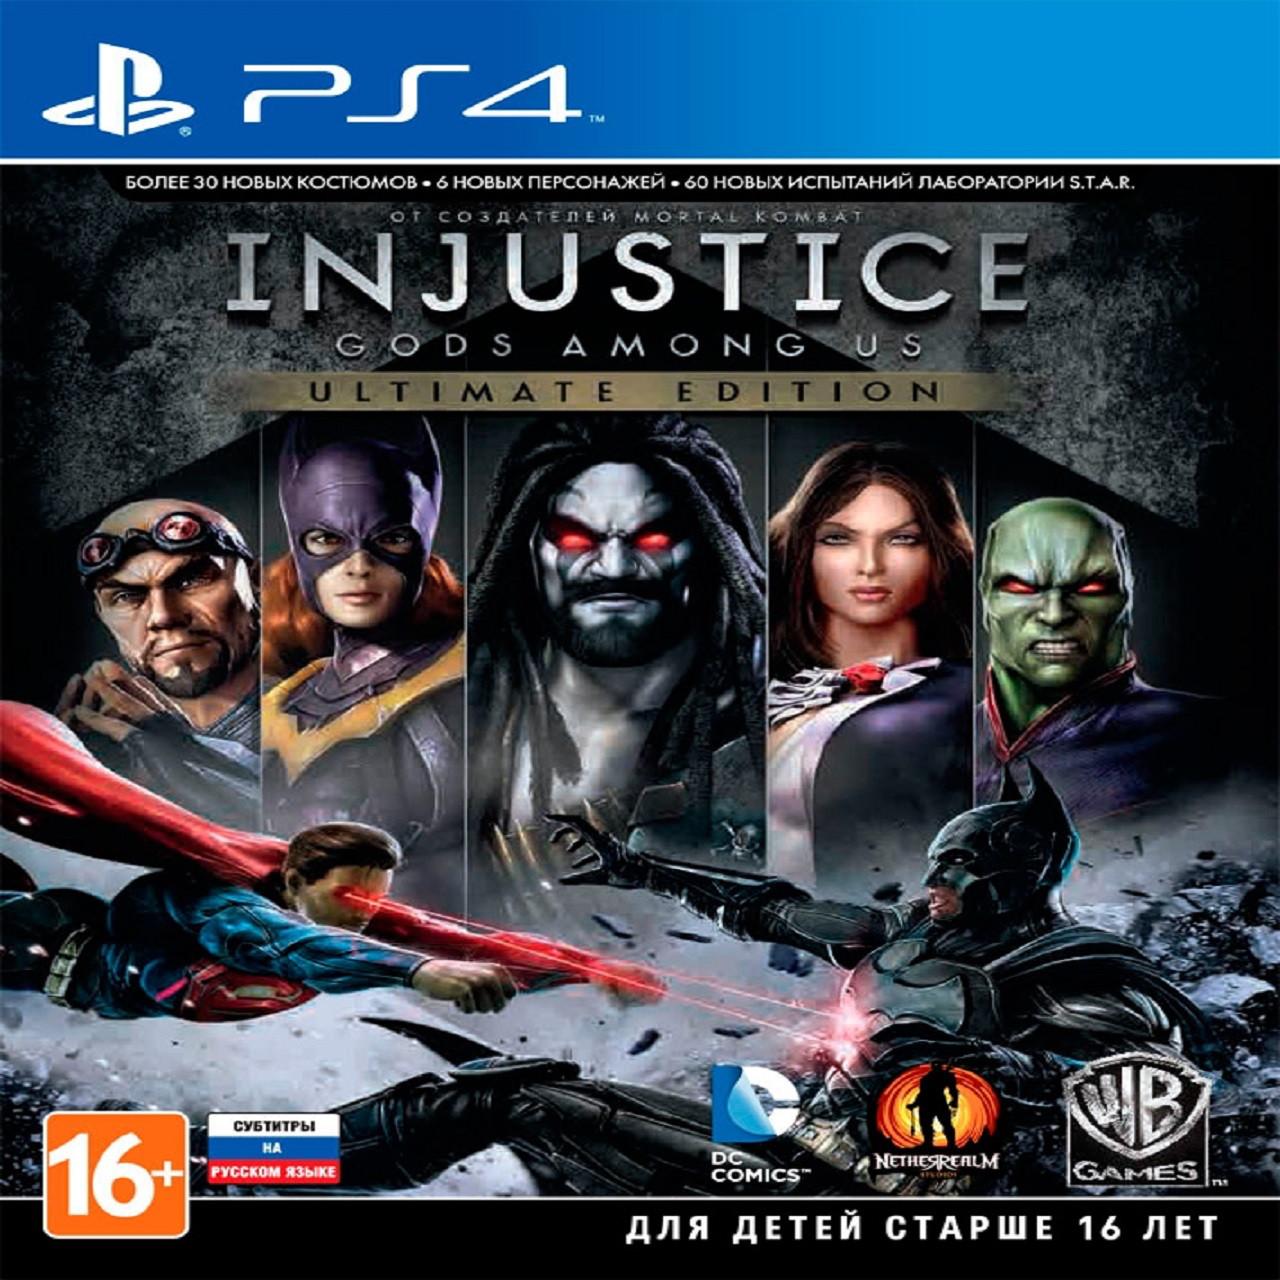 Injustice: Gods Among Us RUS PS4 (Б/В)